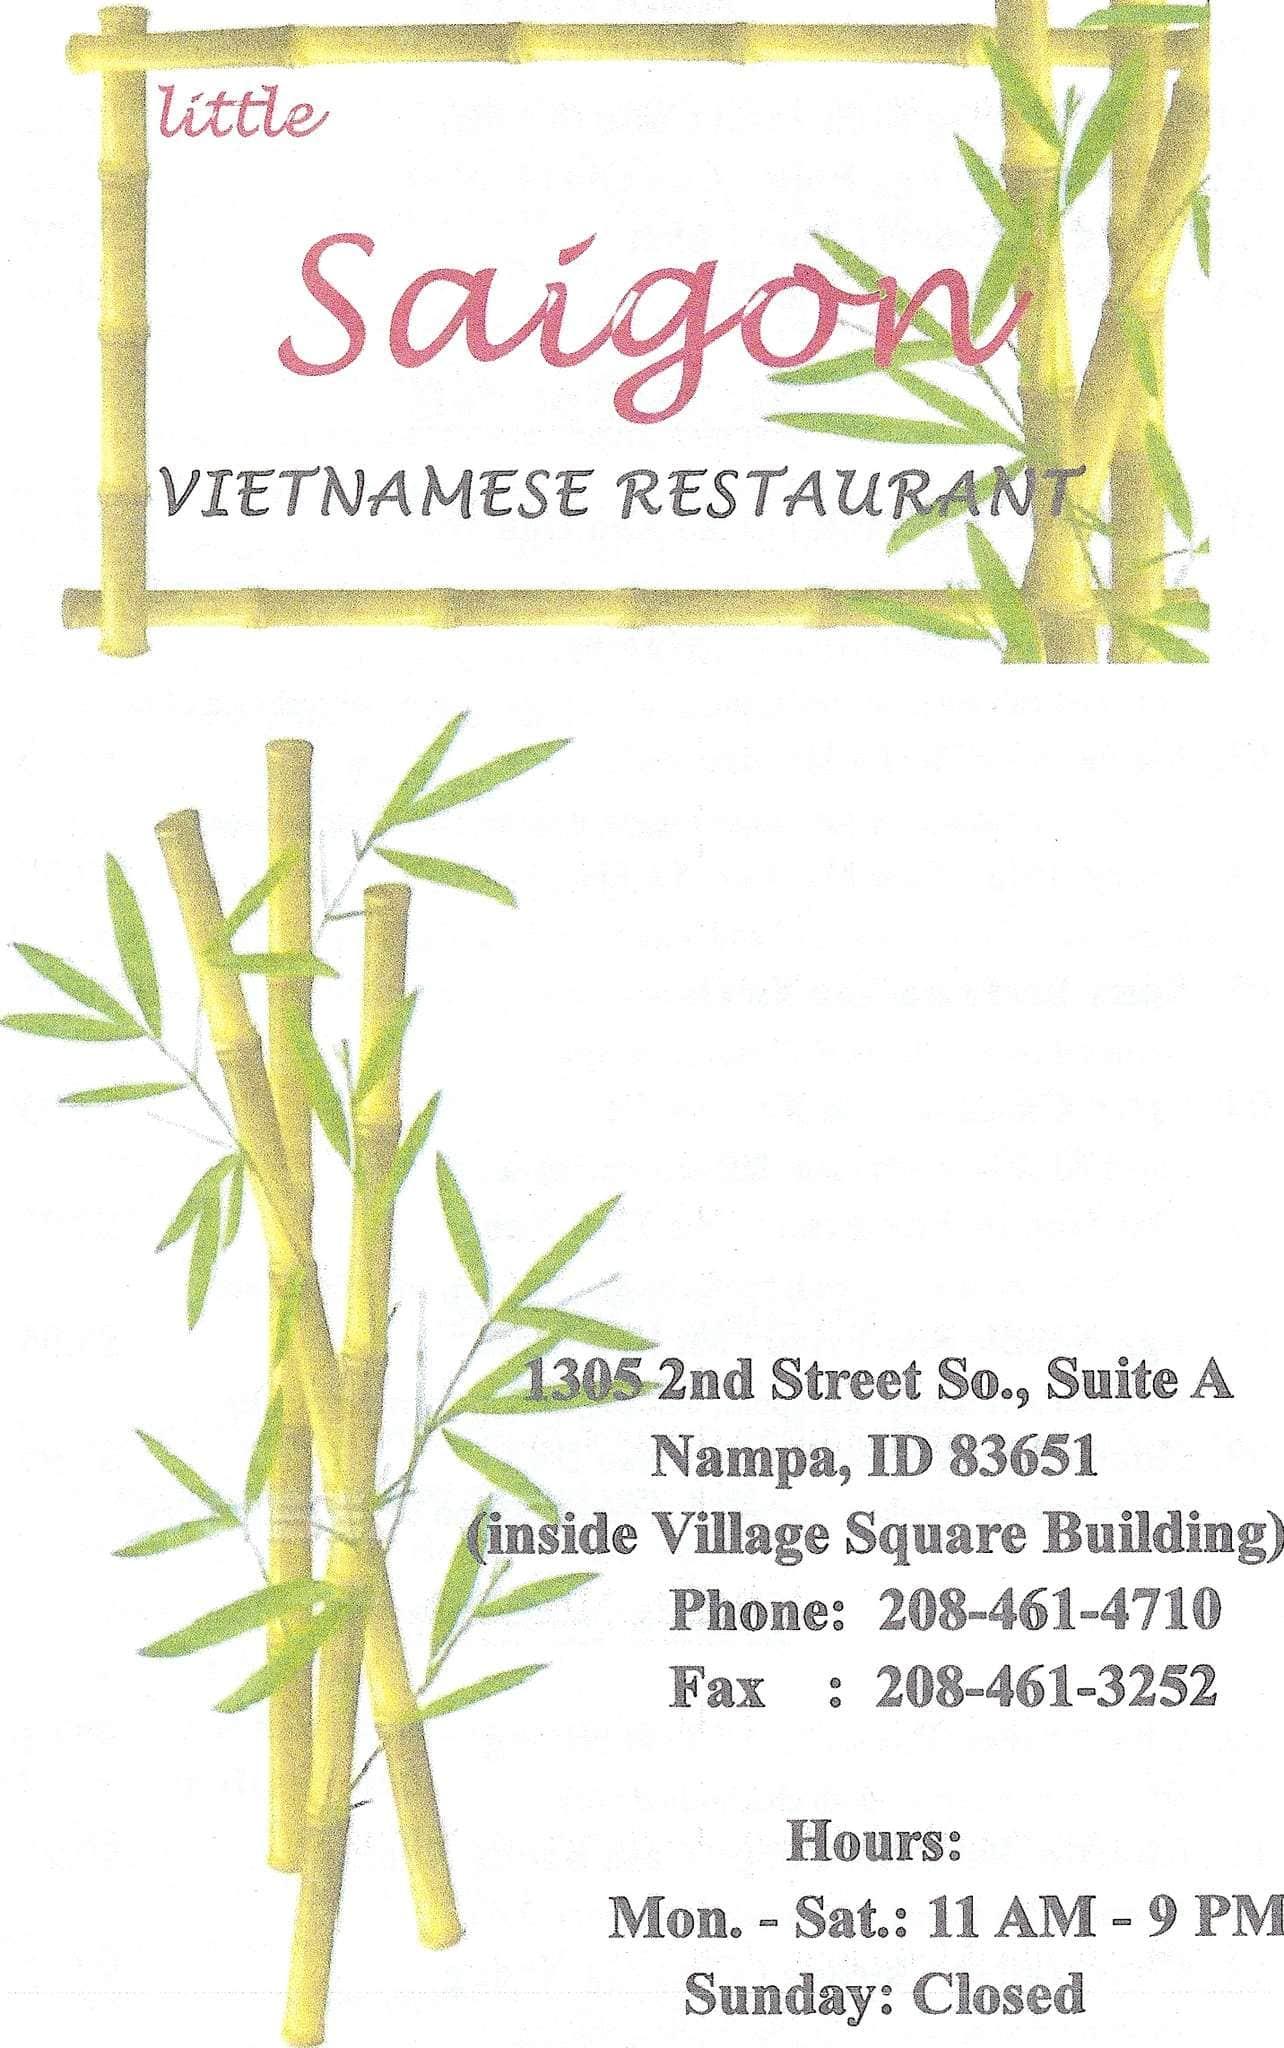 Little Saigon Vietnamese Restaurant Menu Urbanspoon Zomato